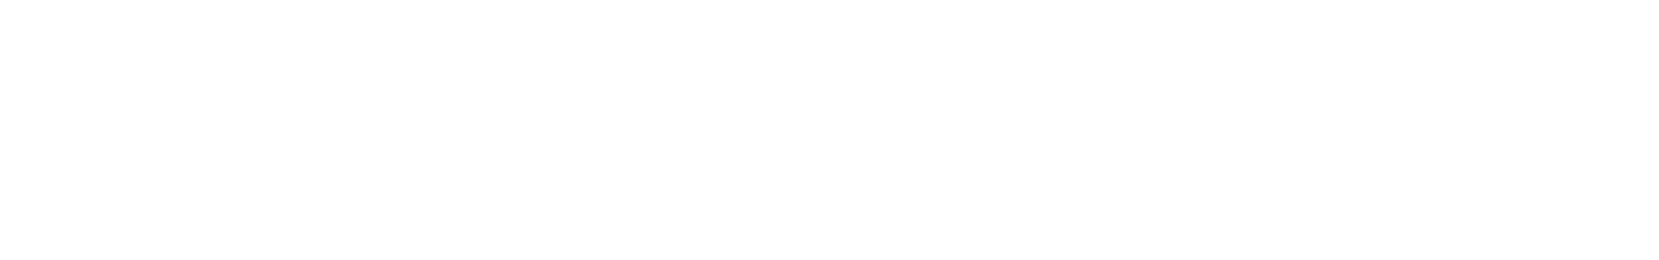 REM_White-01